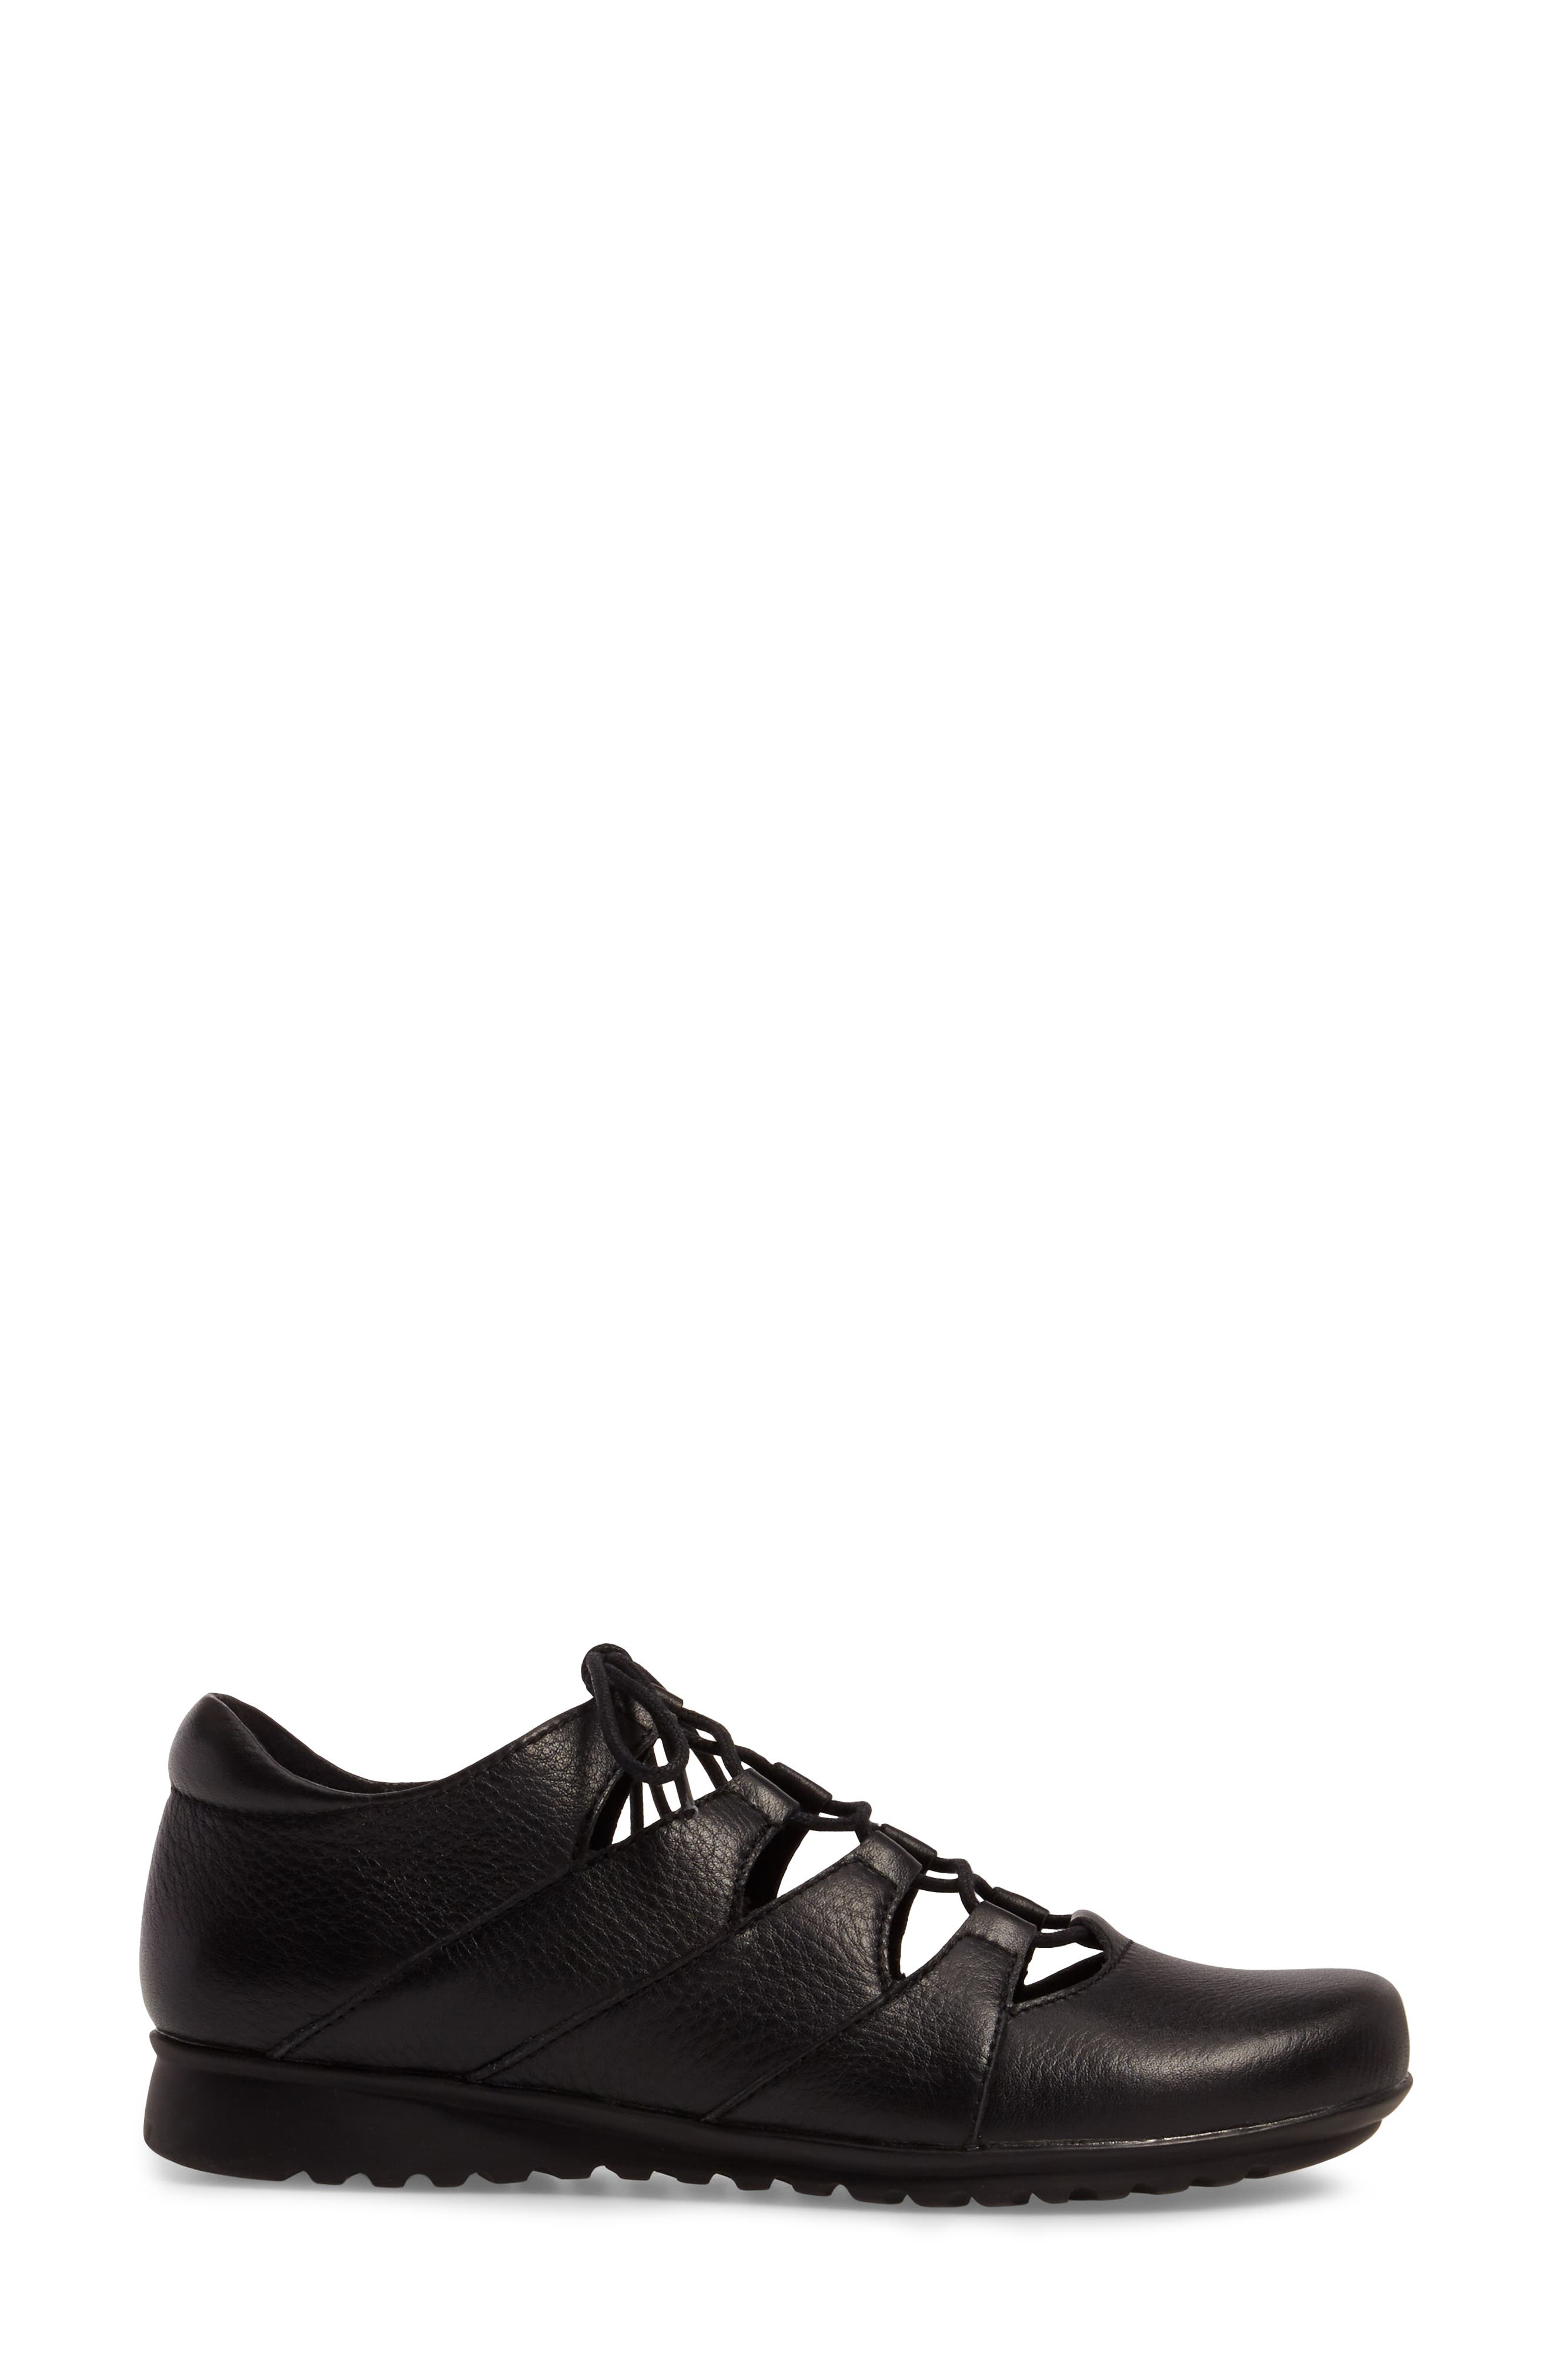 Sienna Cutout Sneaker,                             Alternate thumbnail 3, color,                             BLACK LEATHER/ BLACK